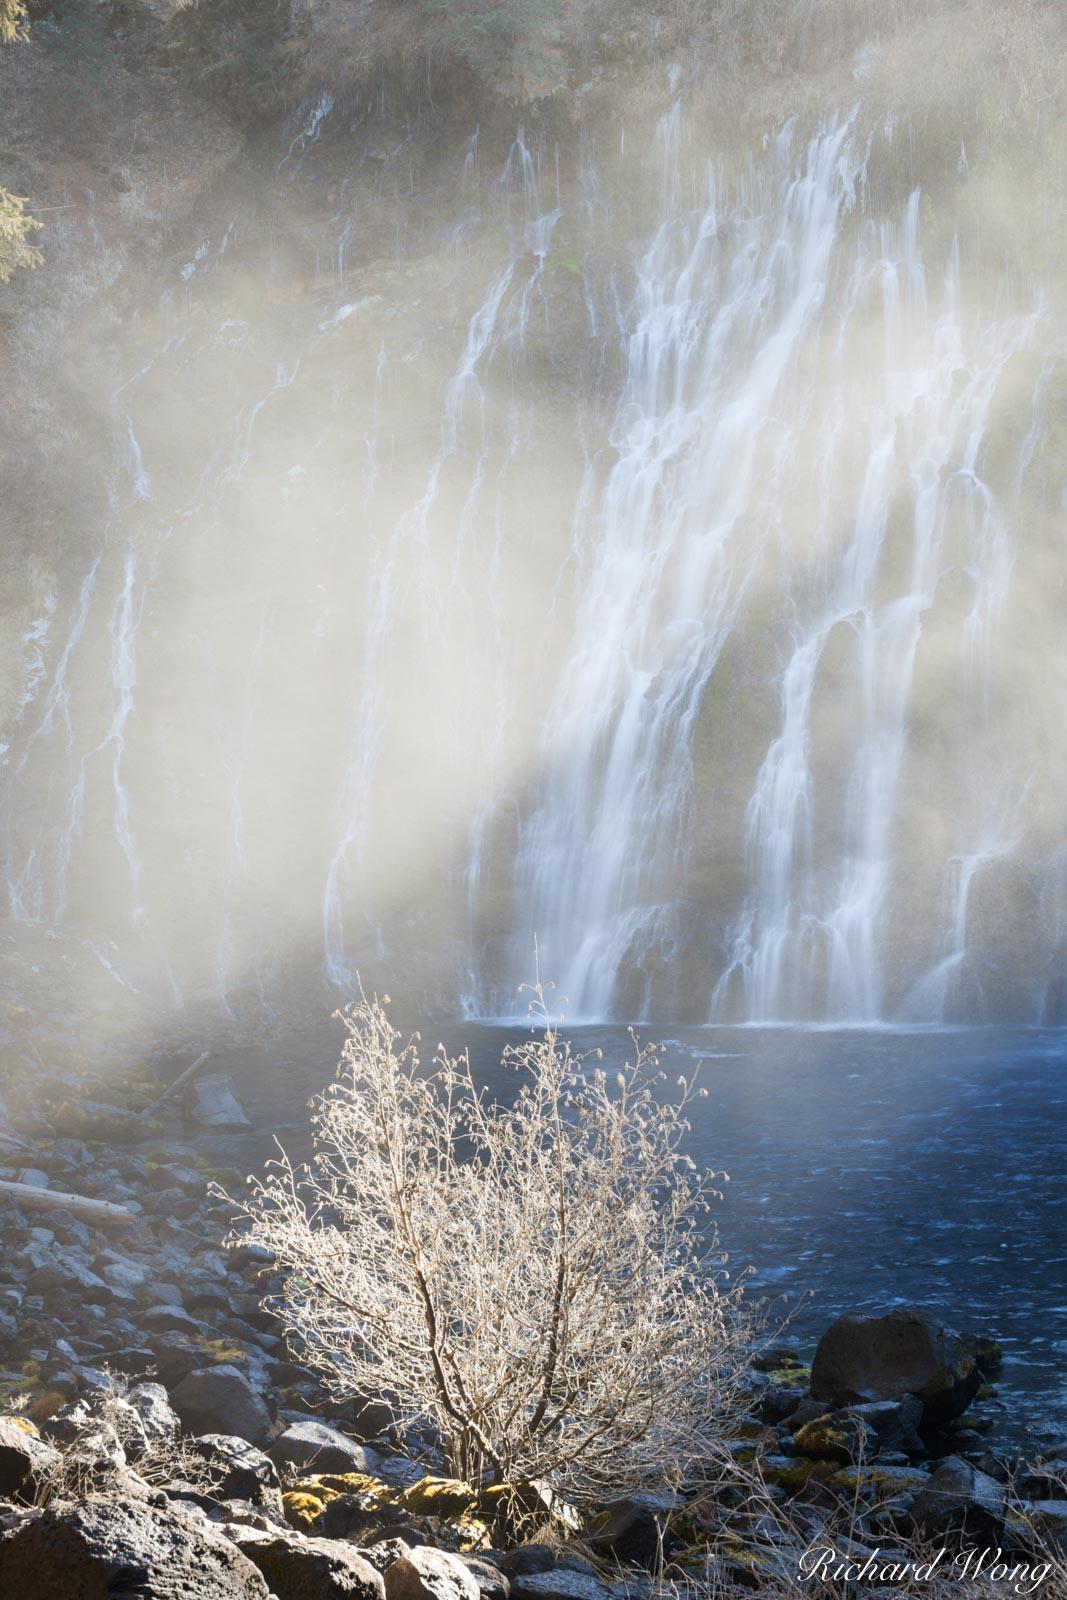 Burney Falls, McArthur-Burney Falls Memorial State Park, California, photo, photo